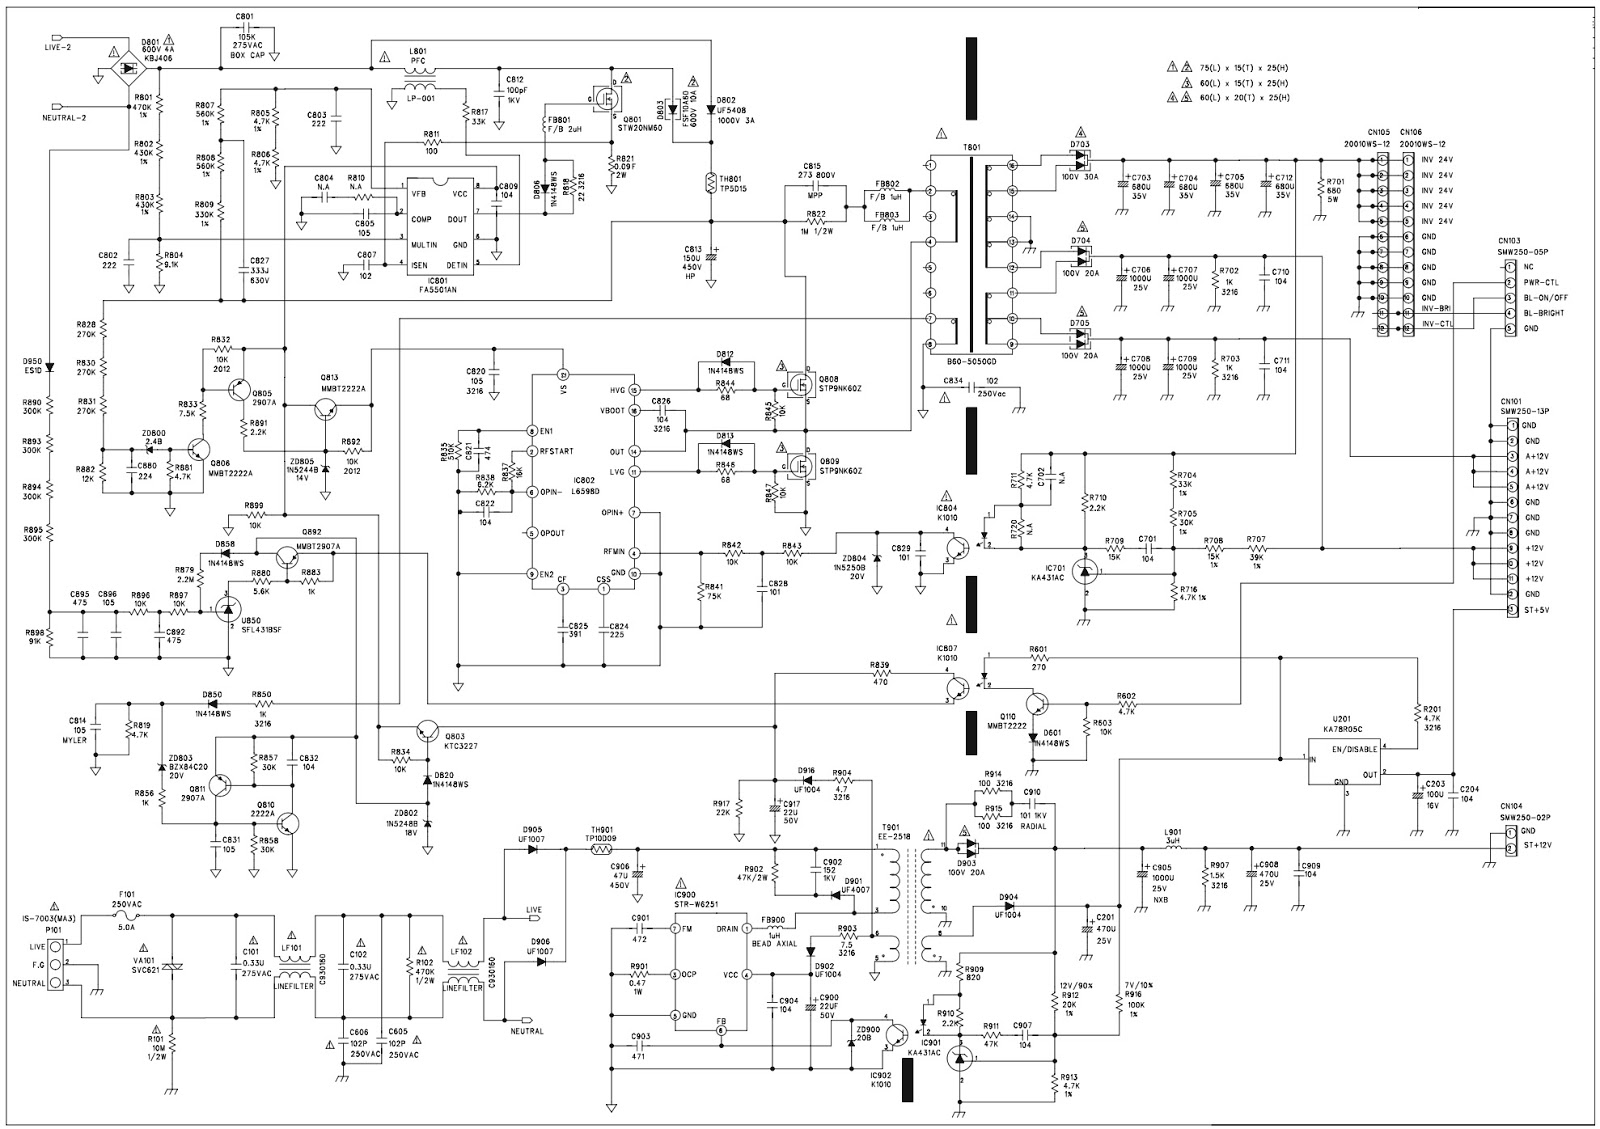 medium resolution of lg tv schematic diagrams wiring diagram compilationlcd tv schematic diagrams wiring diagram toolbox lg television schematic